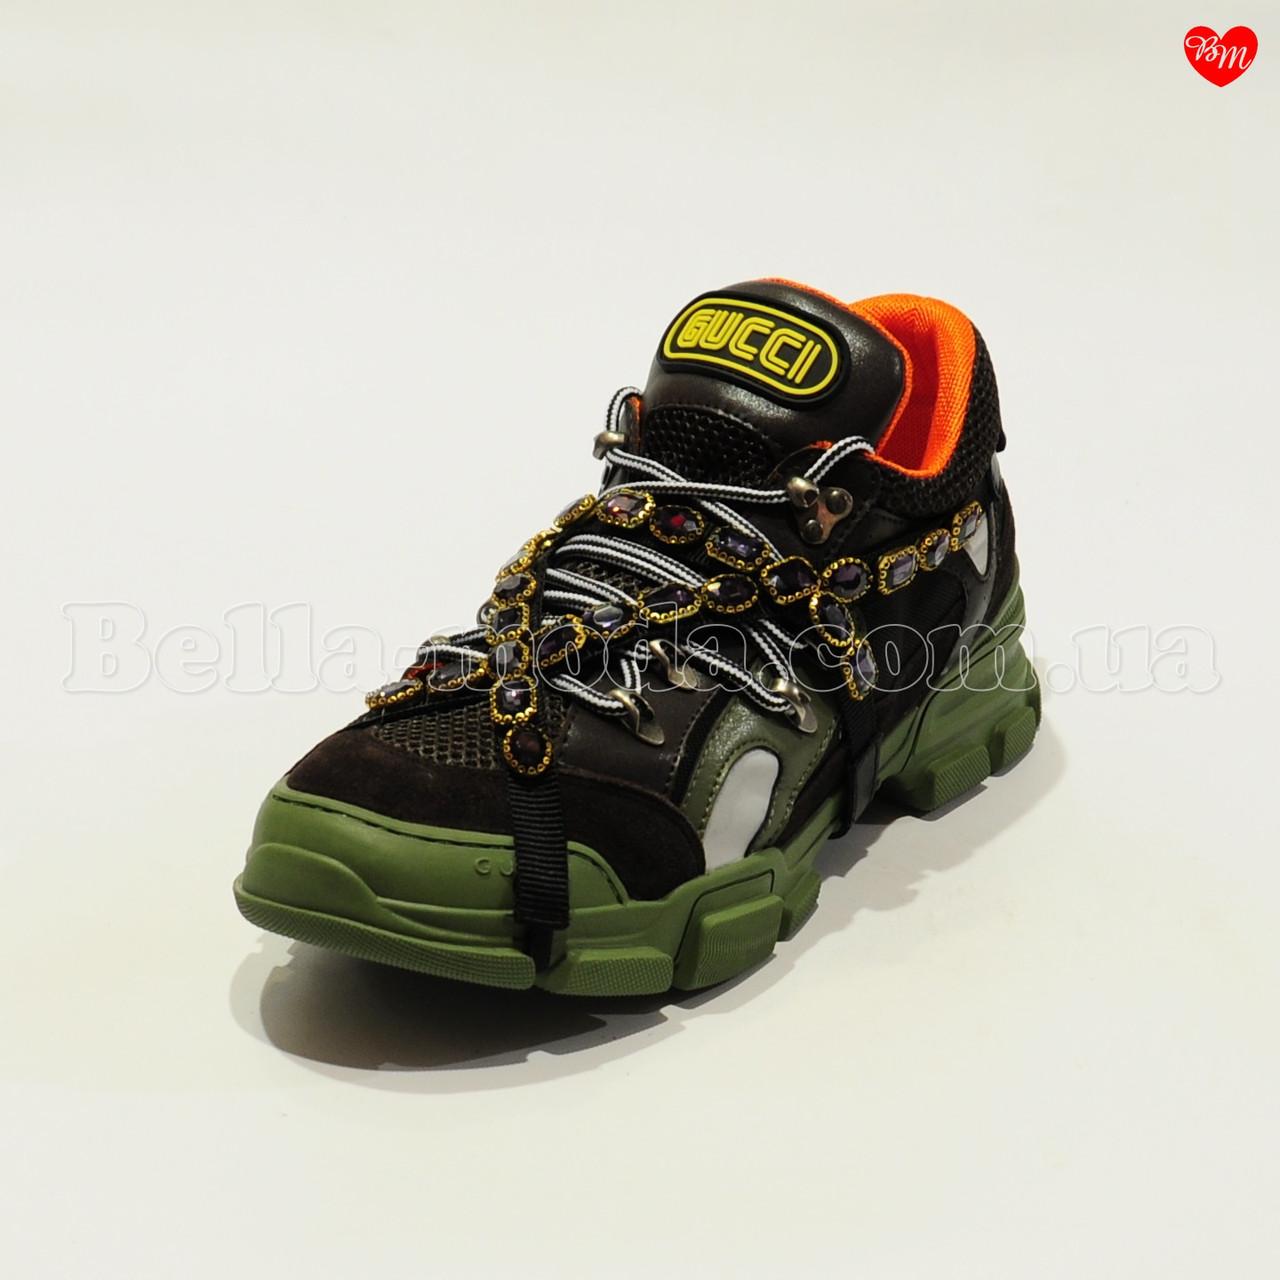 Купить Женские кроссовки камни на ремешке Gucci в розницу от ... 80151fae97b